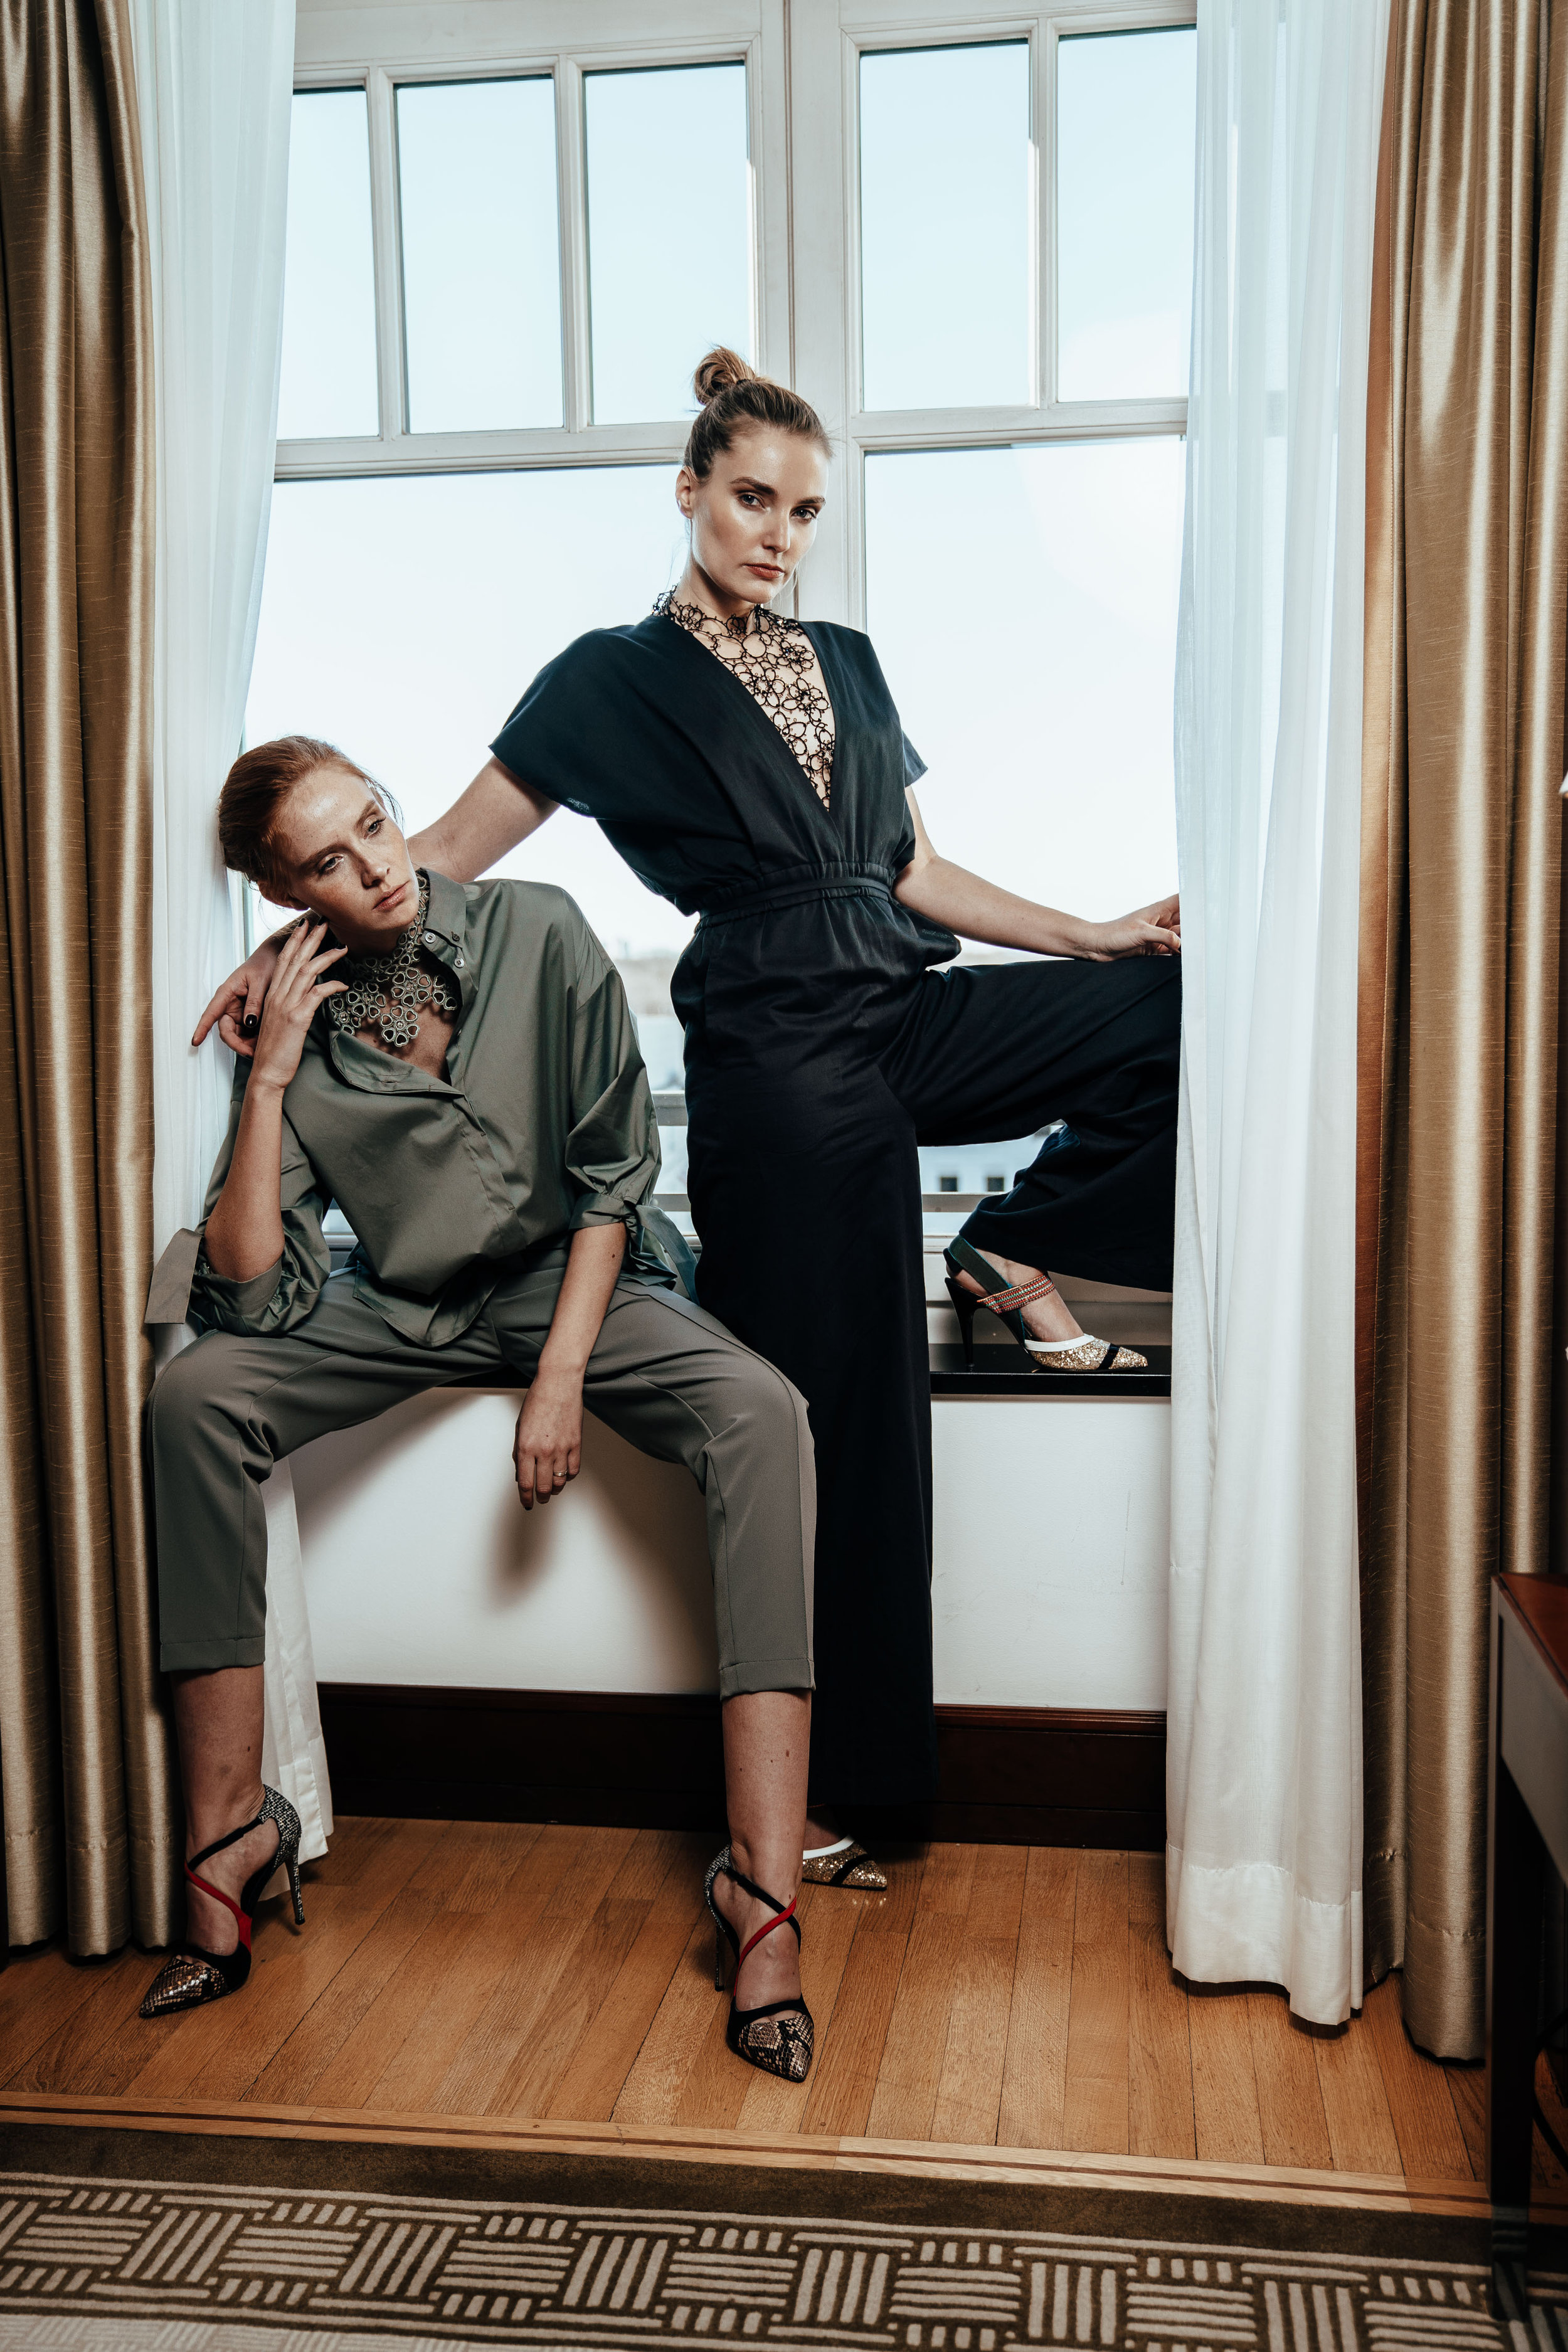 Marie & Sandra - Styling Fashion ShootingPhoto by Daniel GrafHair & Makeup by Coiffeur Sergio for Labiostetiqueparis